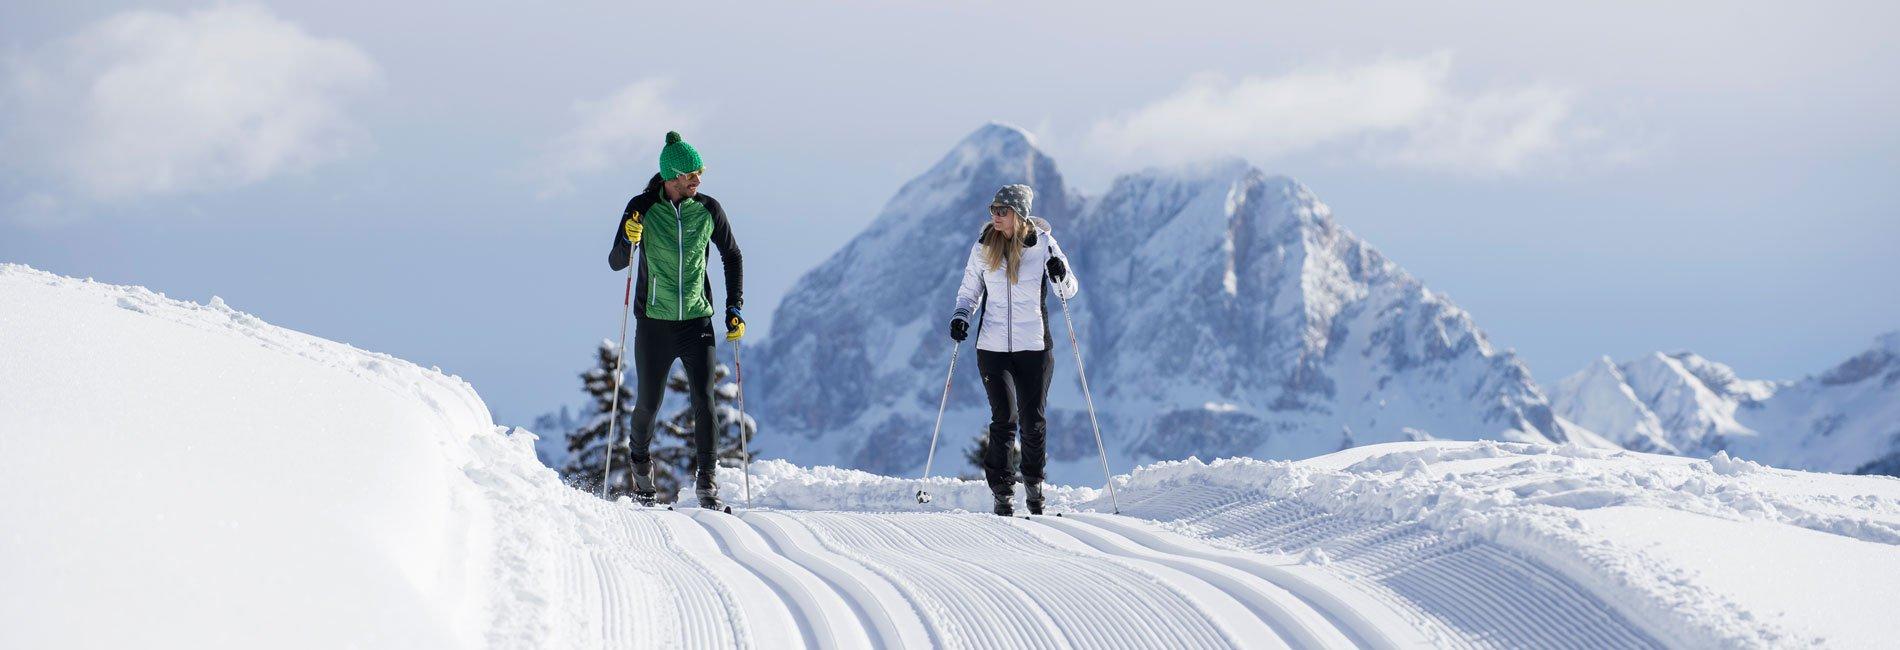 skiurlaub-meransen-11